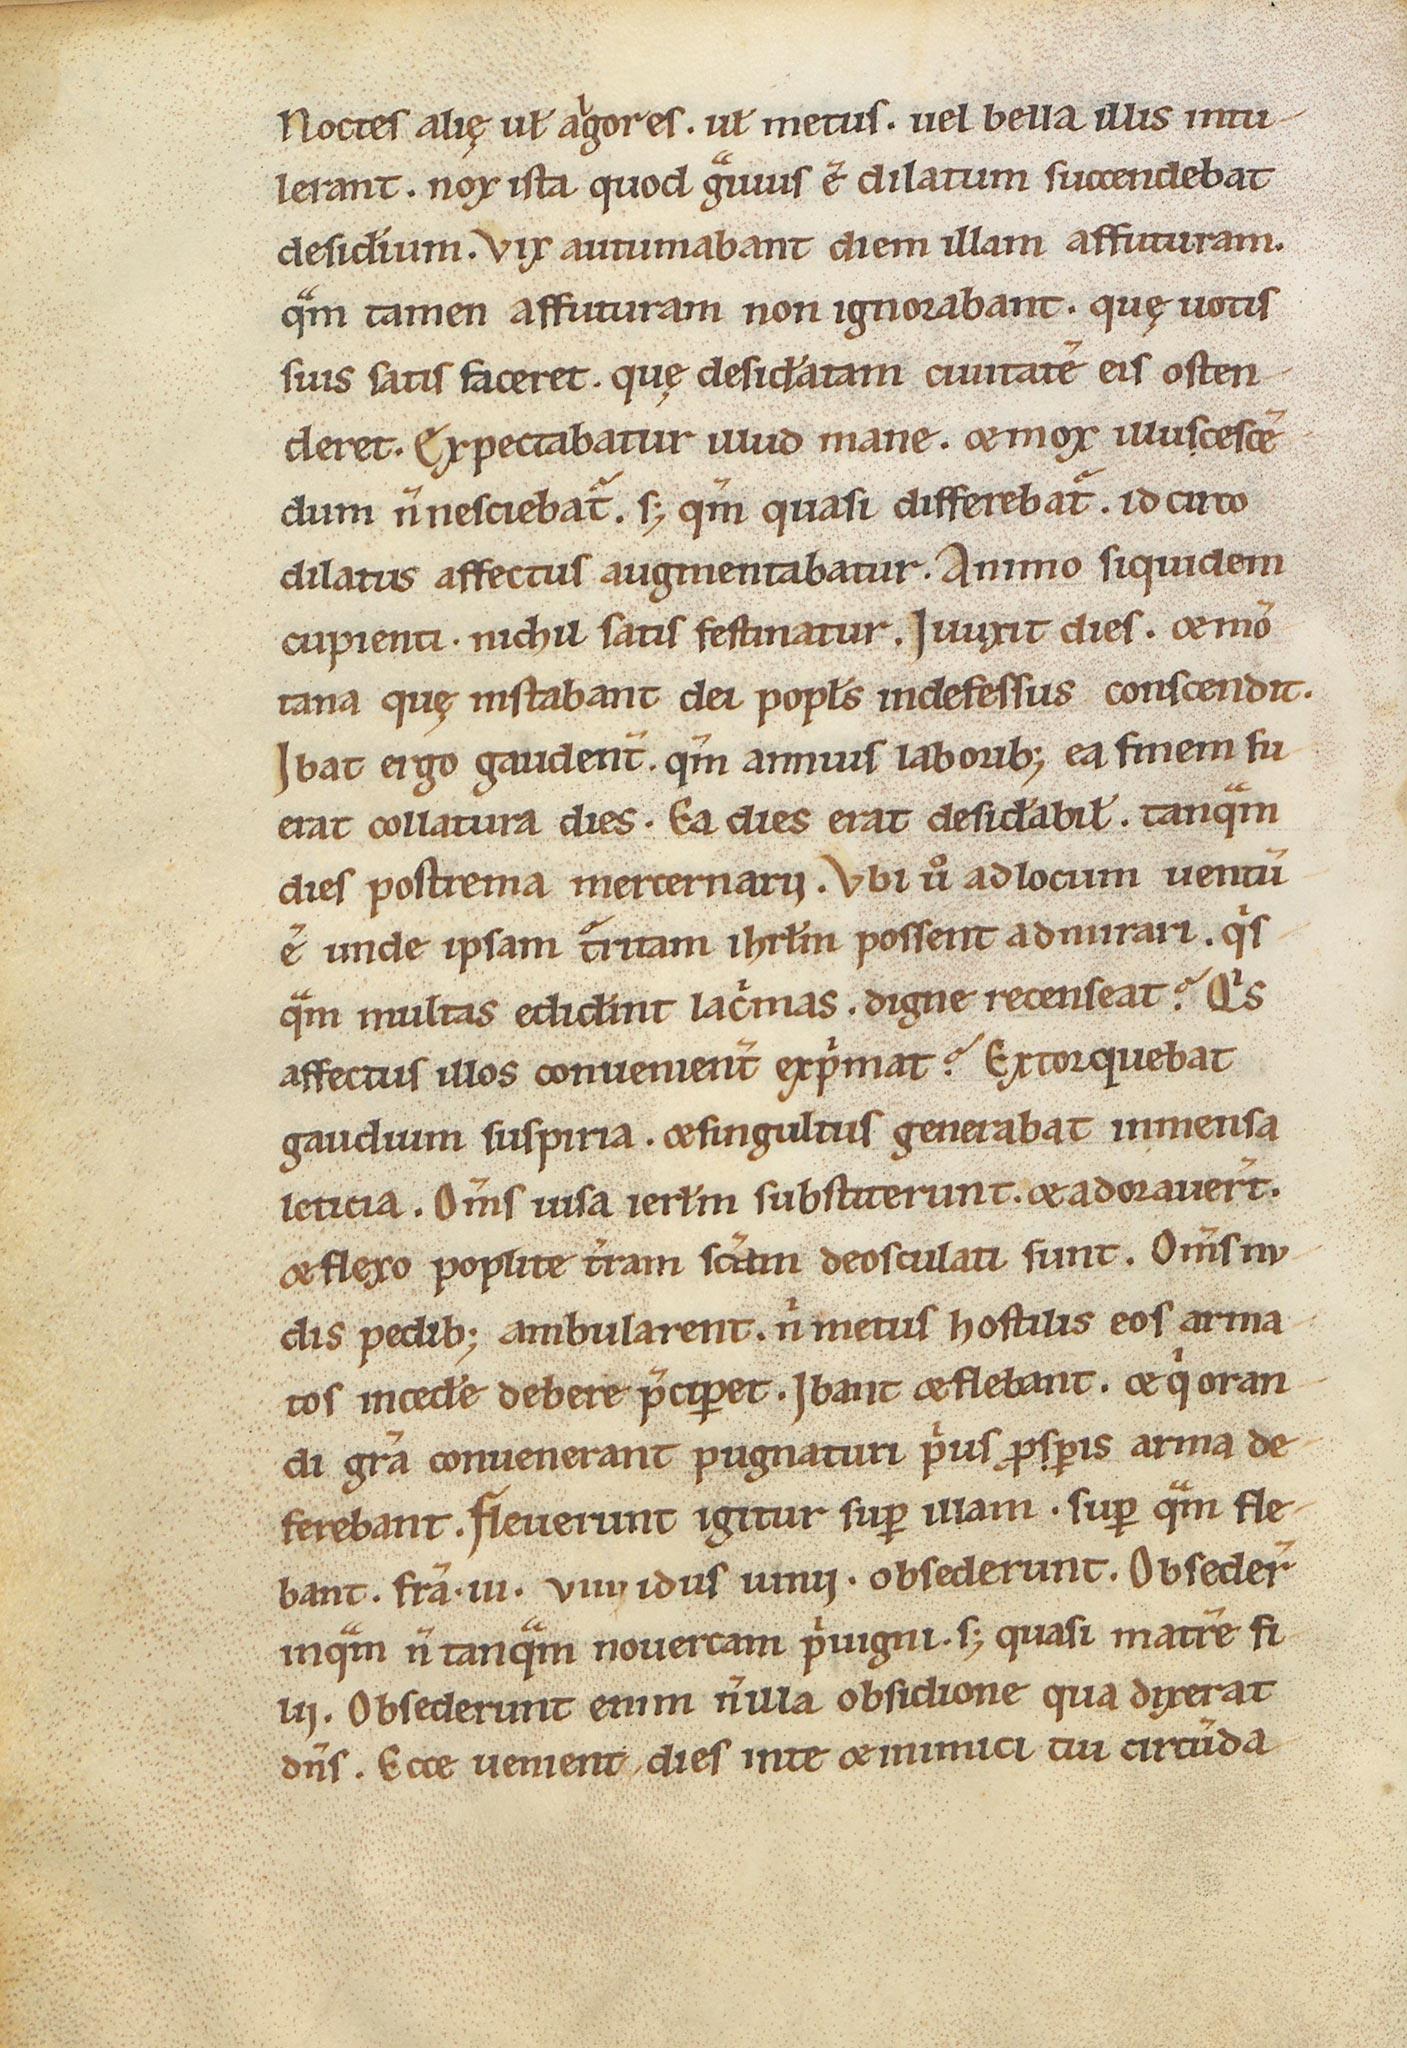 Manuscrit-Historia-Hierosolimitana-89v°